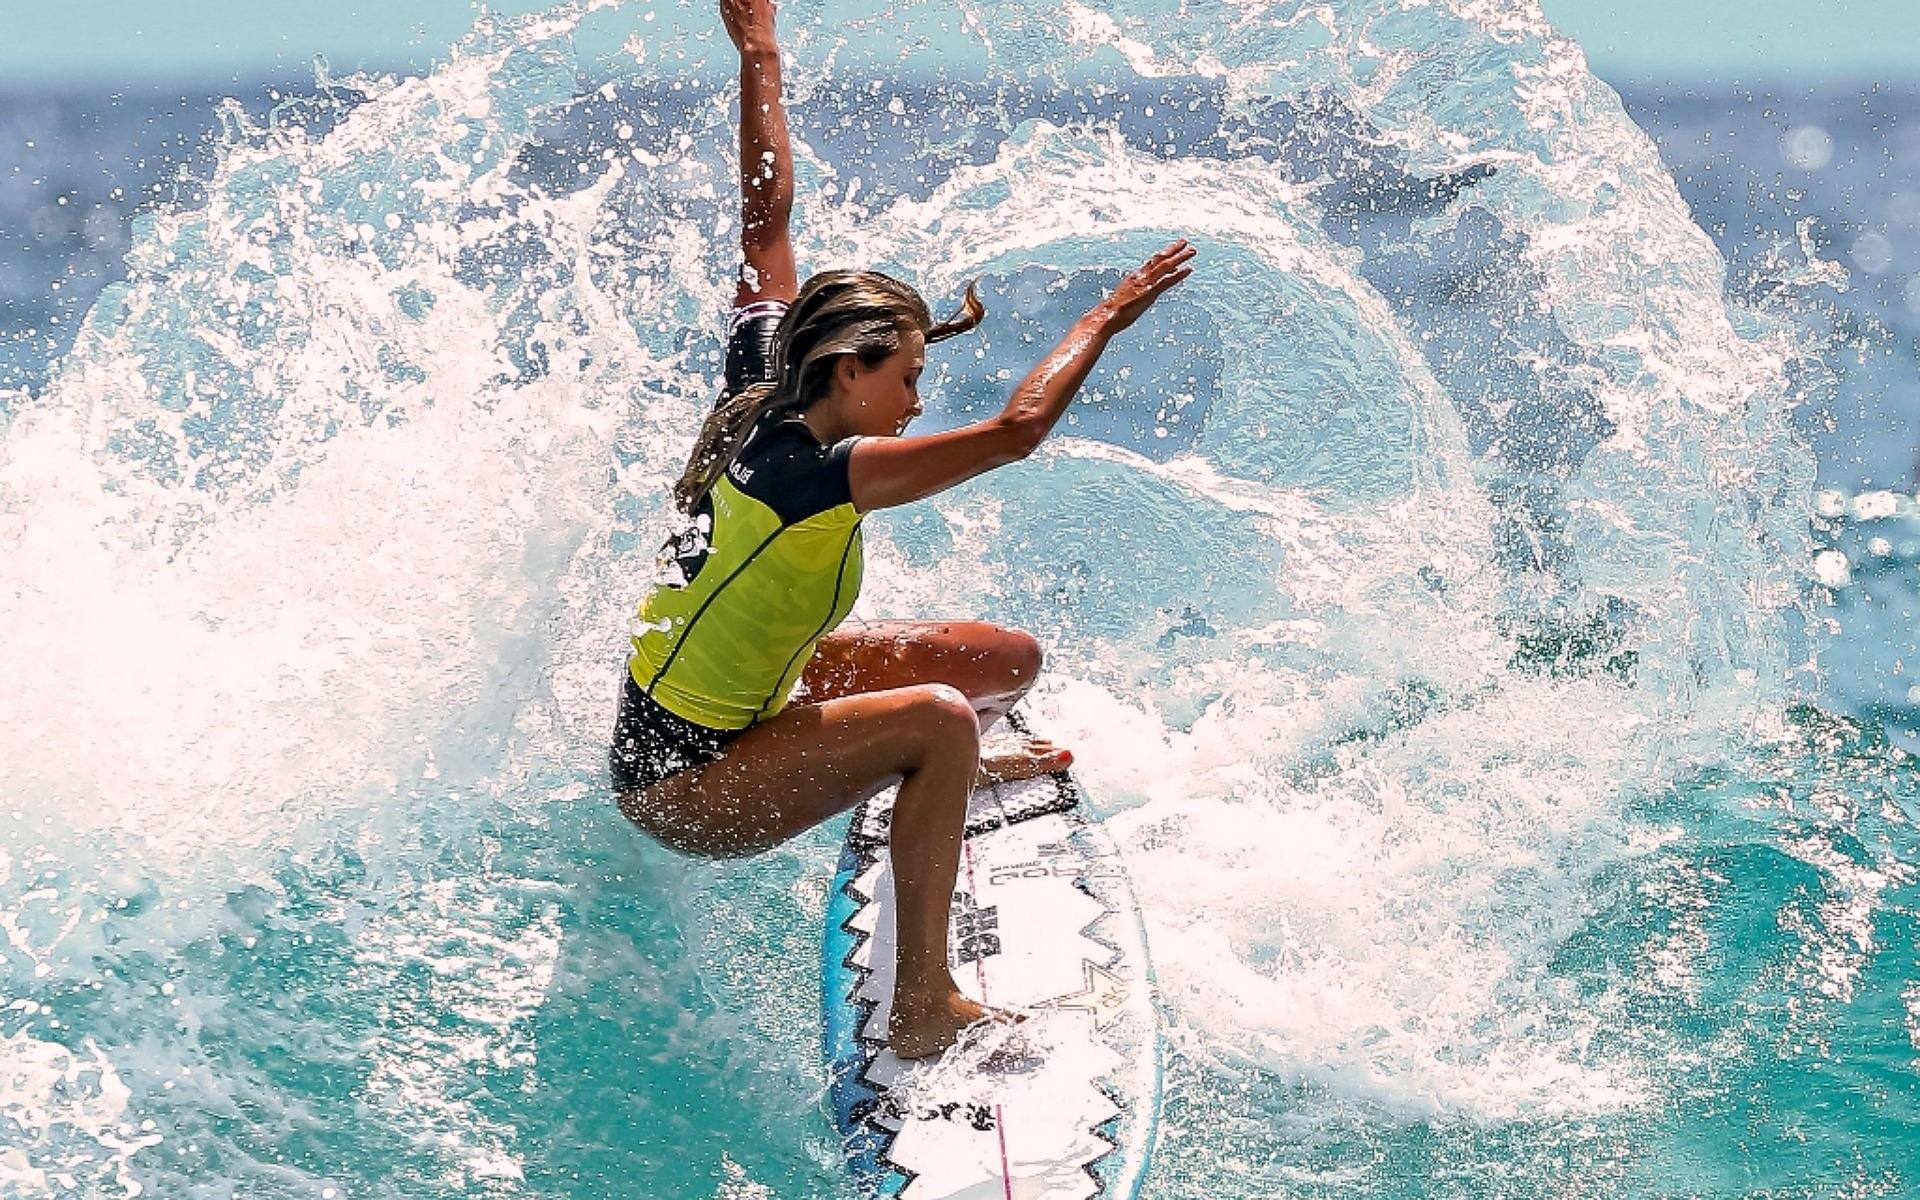 Res: 1920x1200, Motivational, Surfer, Surfing, Water Splashing, Surfer Girl, Alana  Blanchard, Alana